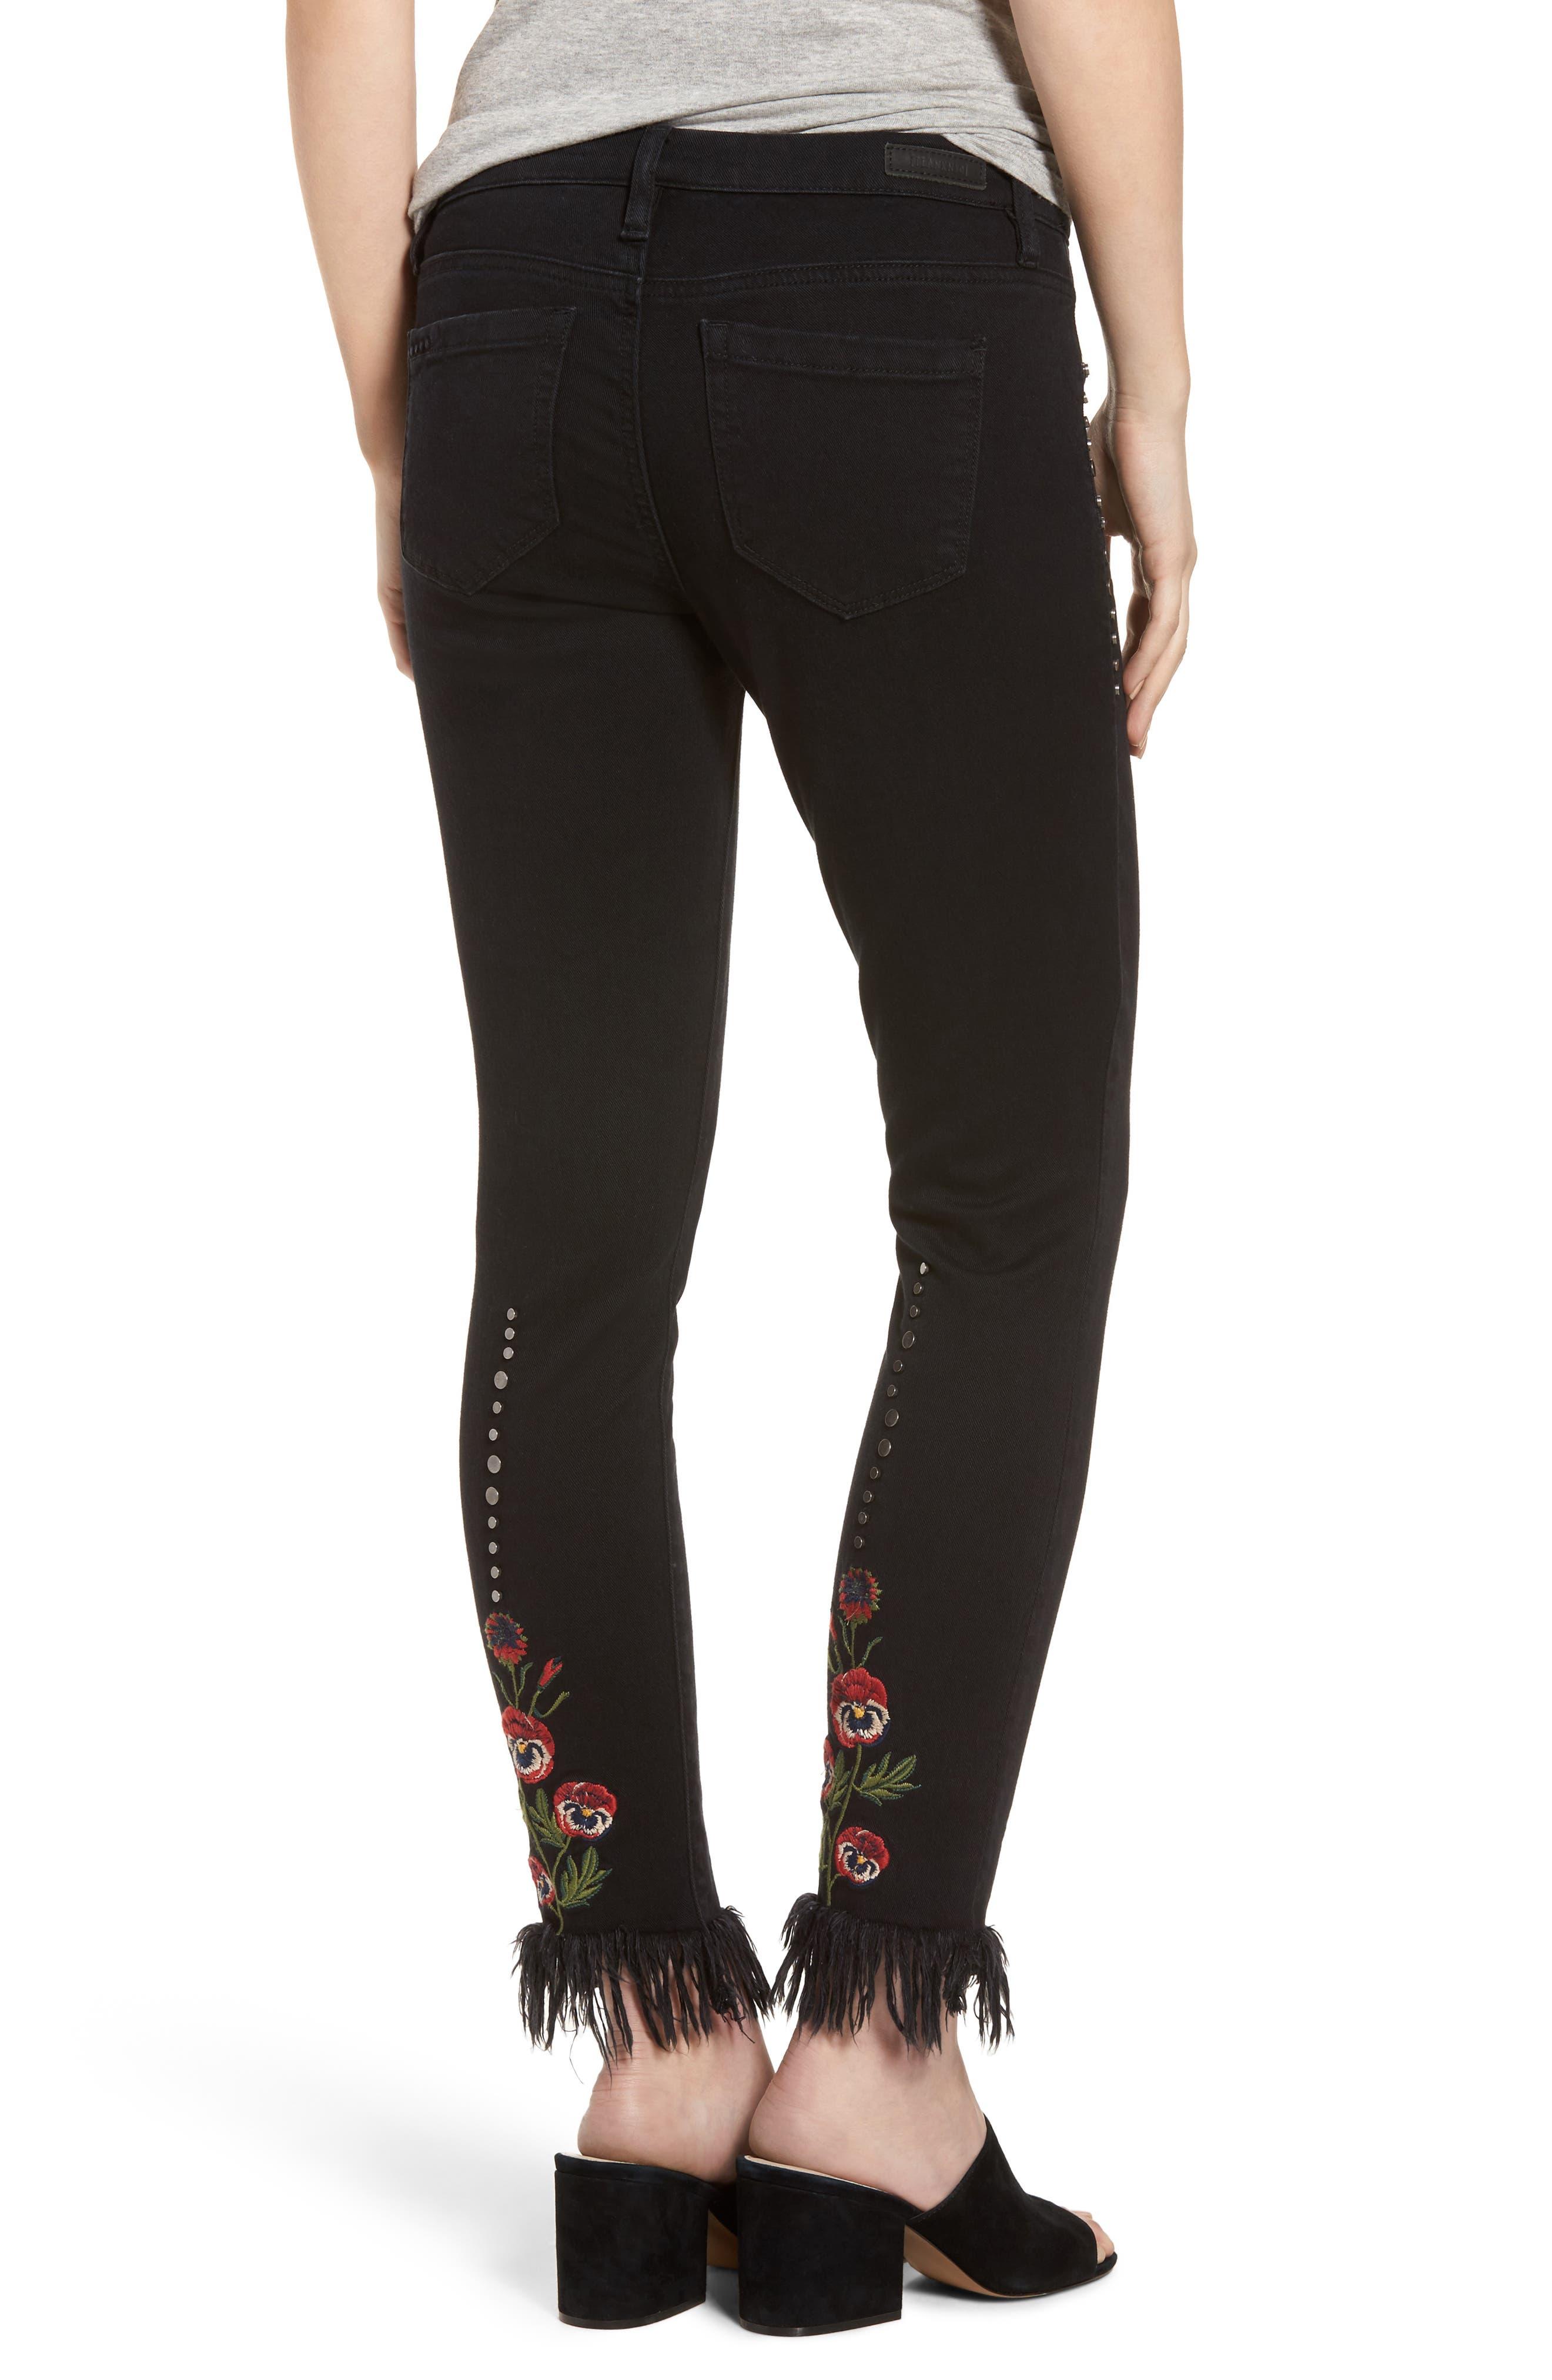 Embroidered & Studded Skinny Jeans,                             Alternate thumbnail 3, color,                             Hidden Talent Black